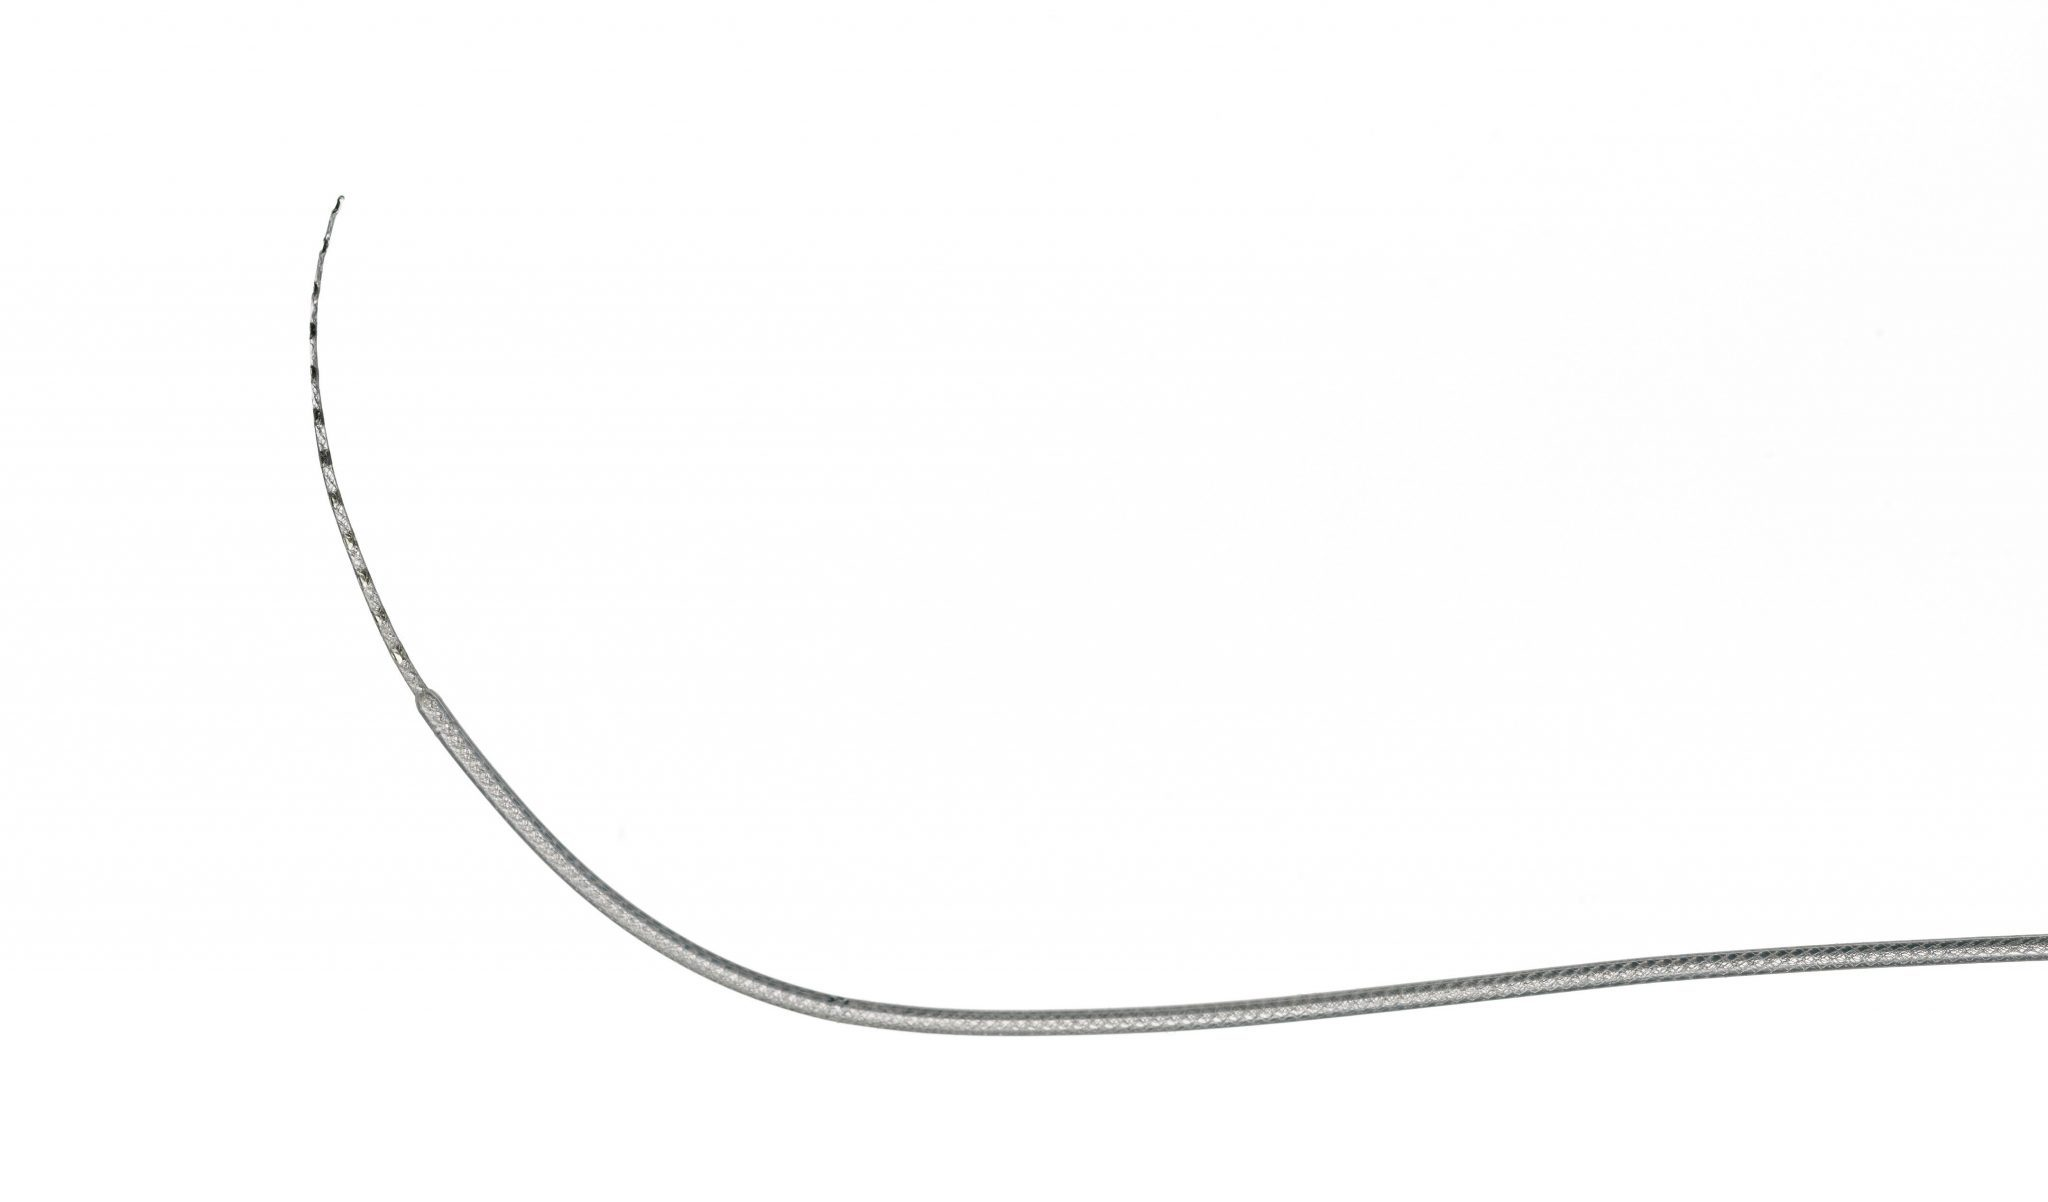 The FLEX-Tip makes for more flexible electrodes.